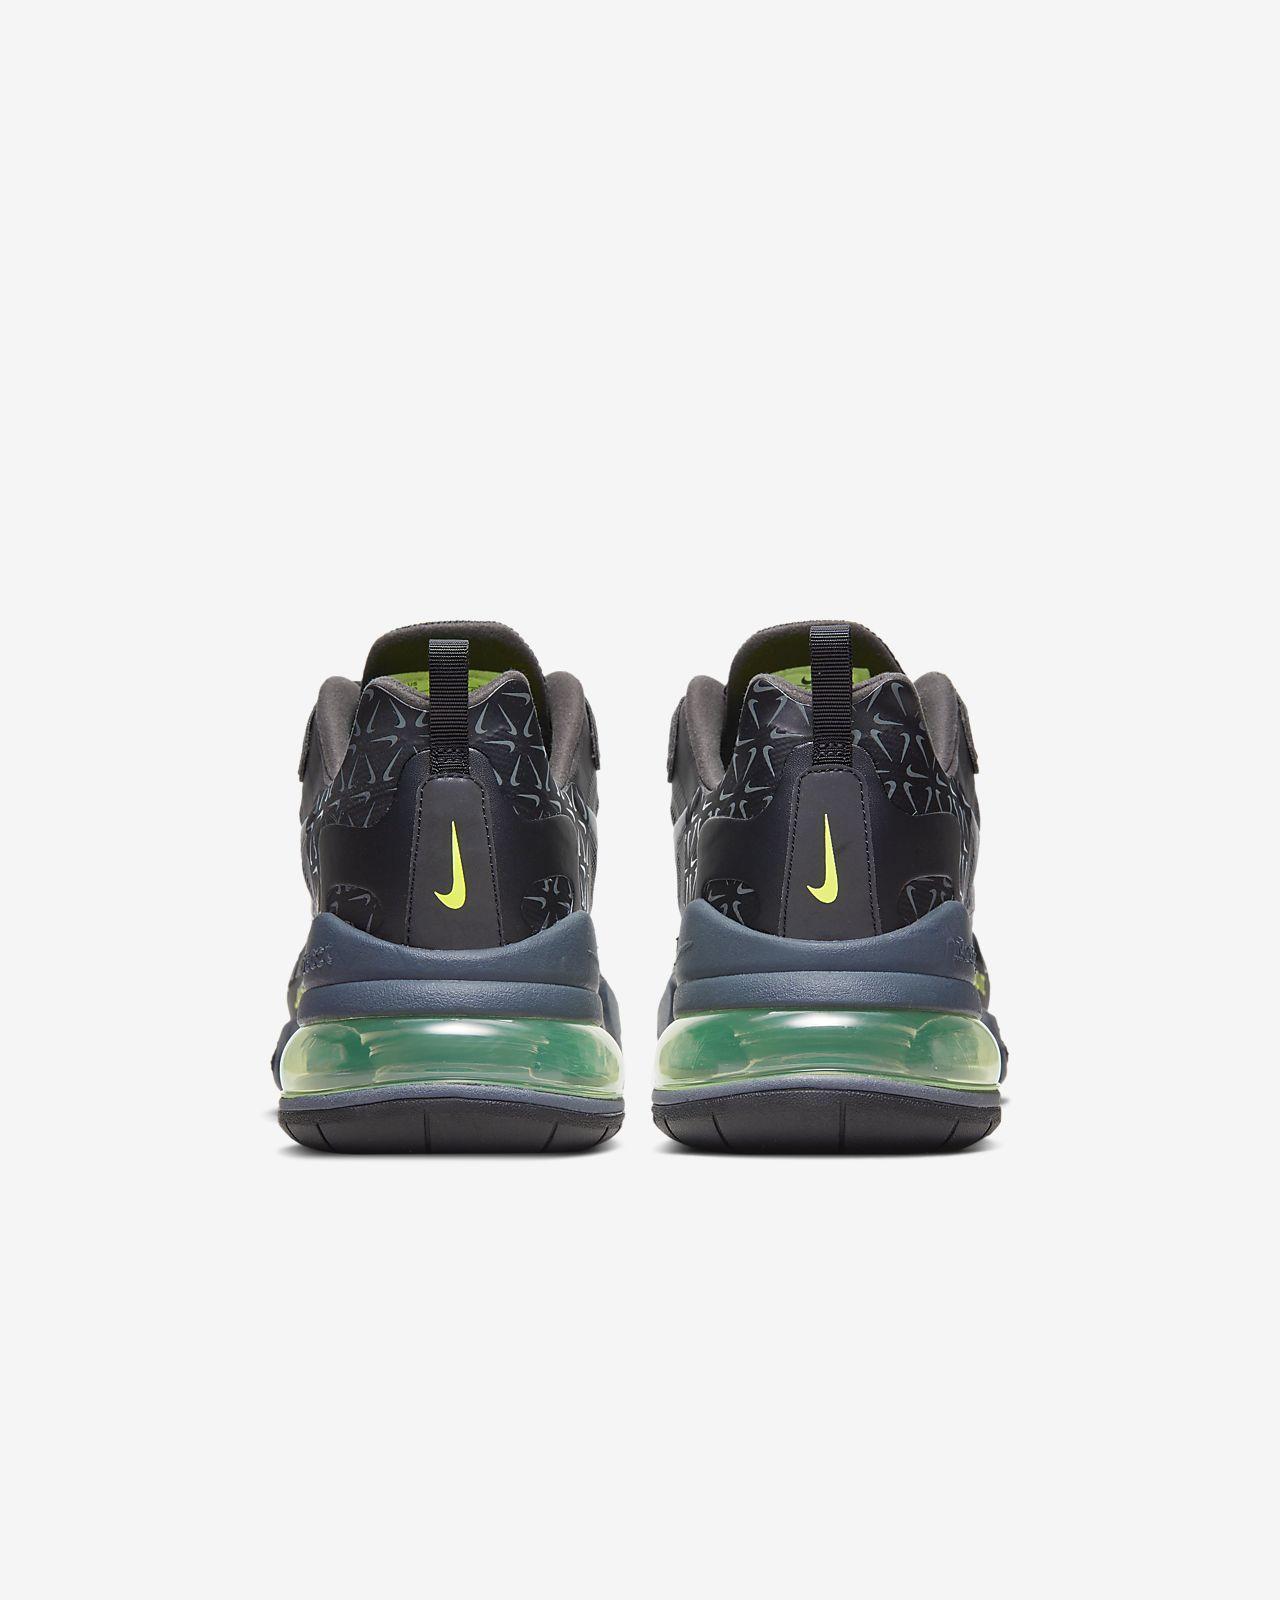 acerca de Parpadeo Rítmico  nike air max 270 hombre españa Shop Clothing & Shoes Online